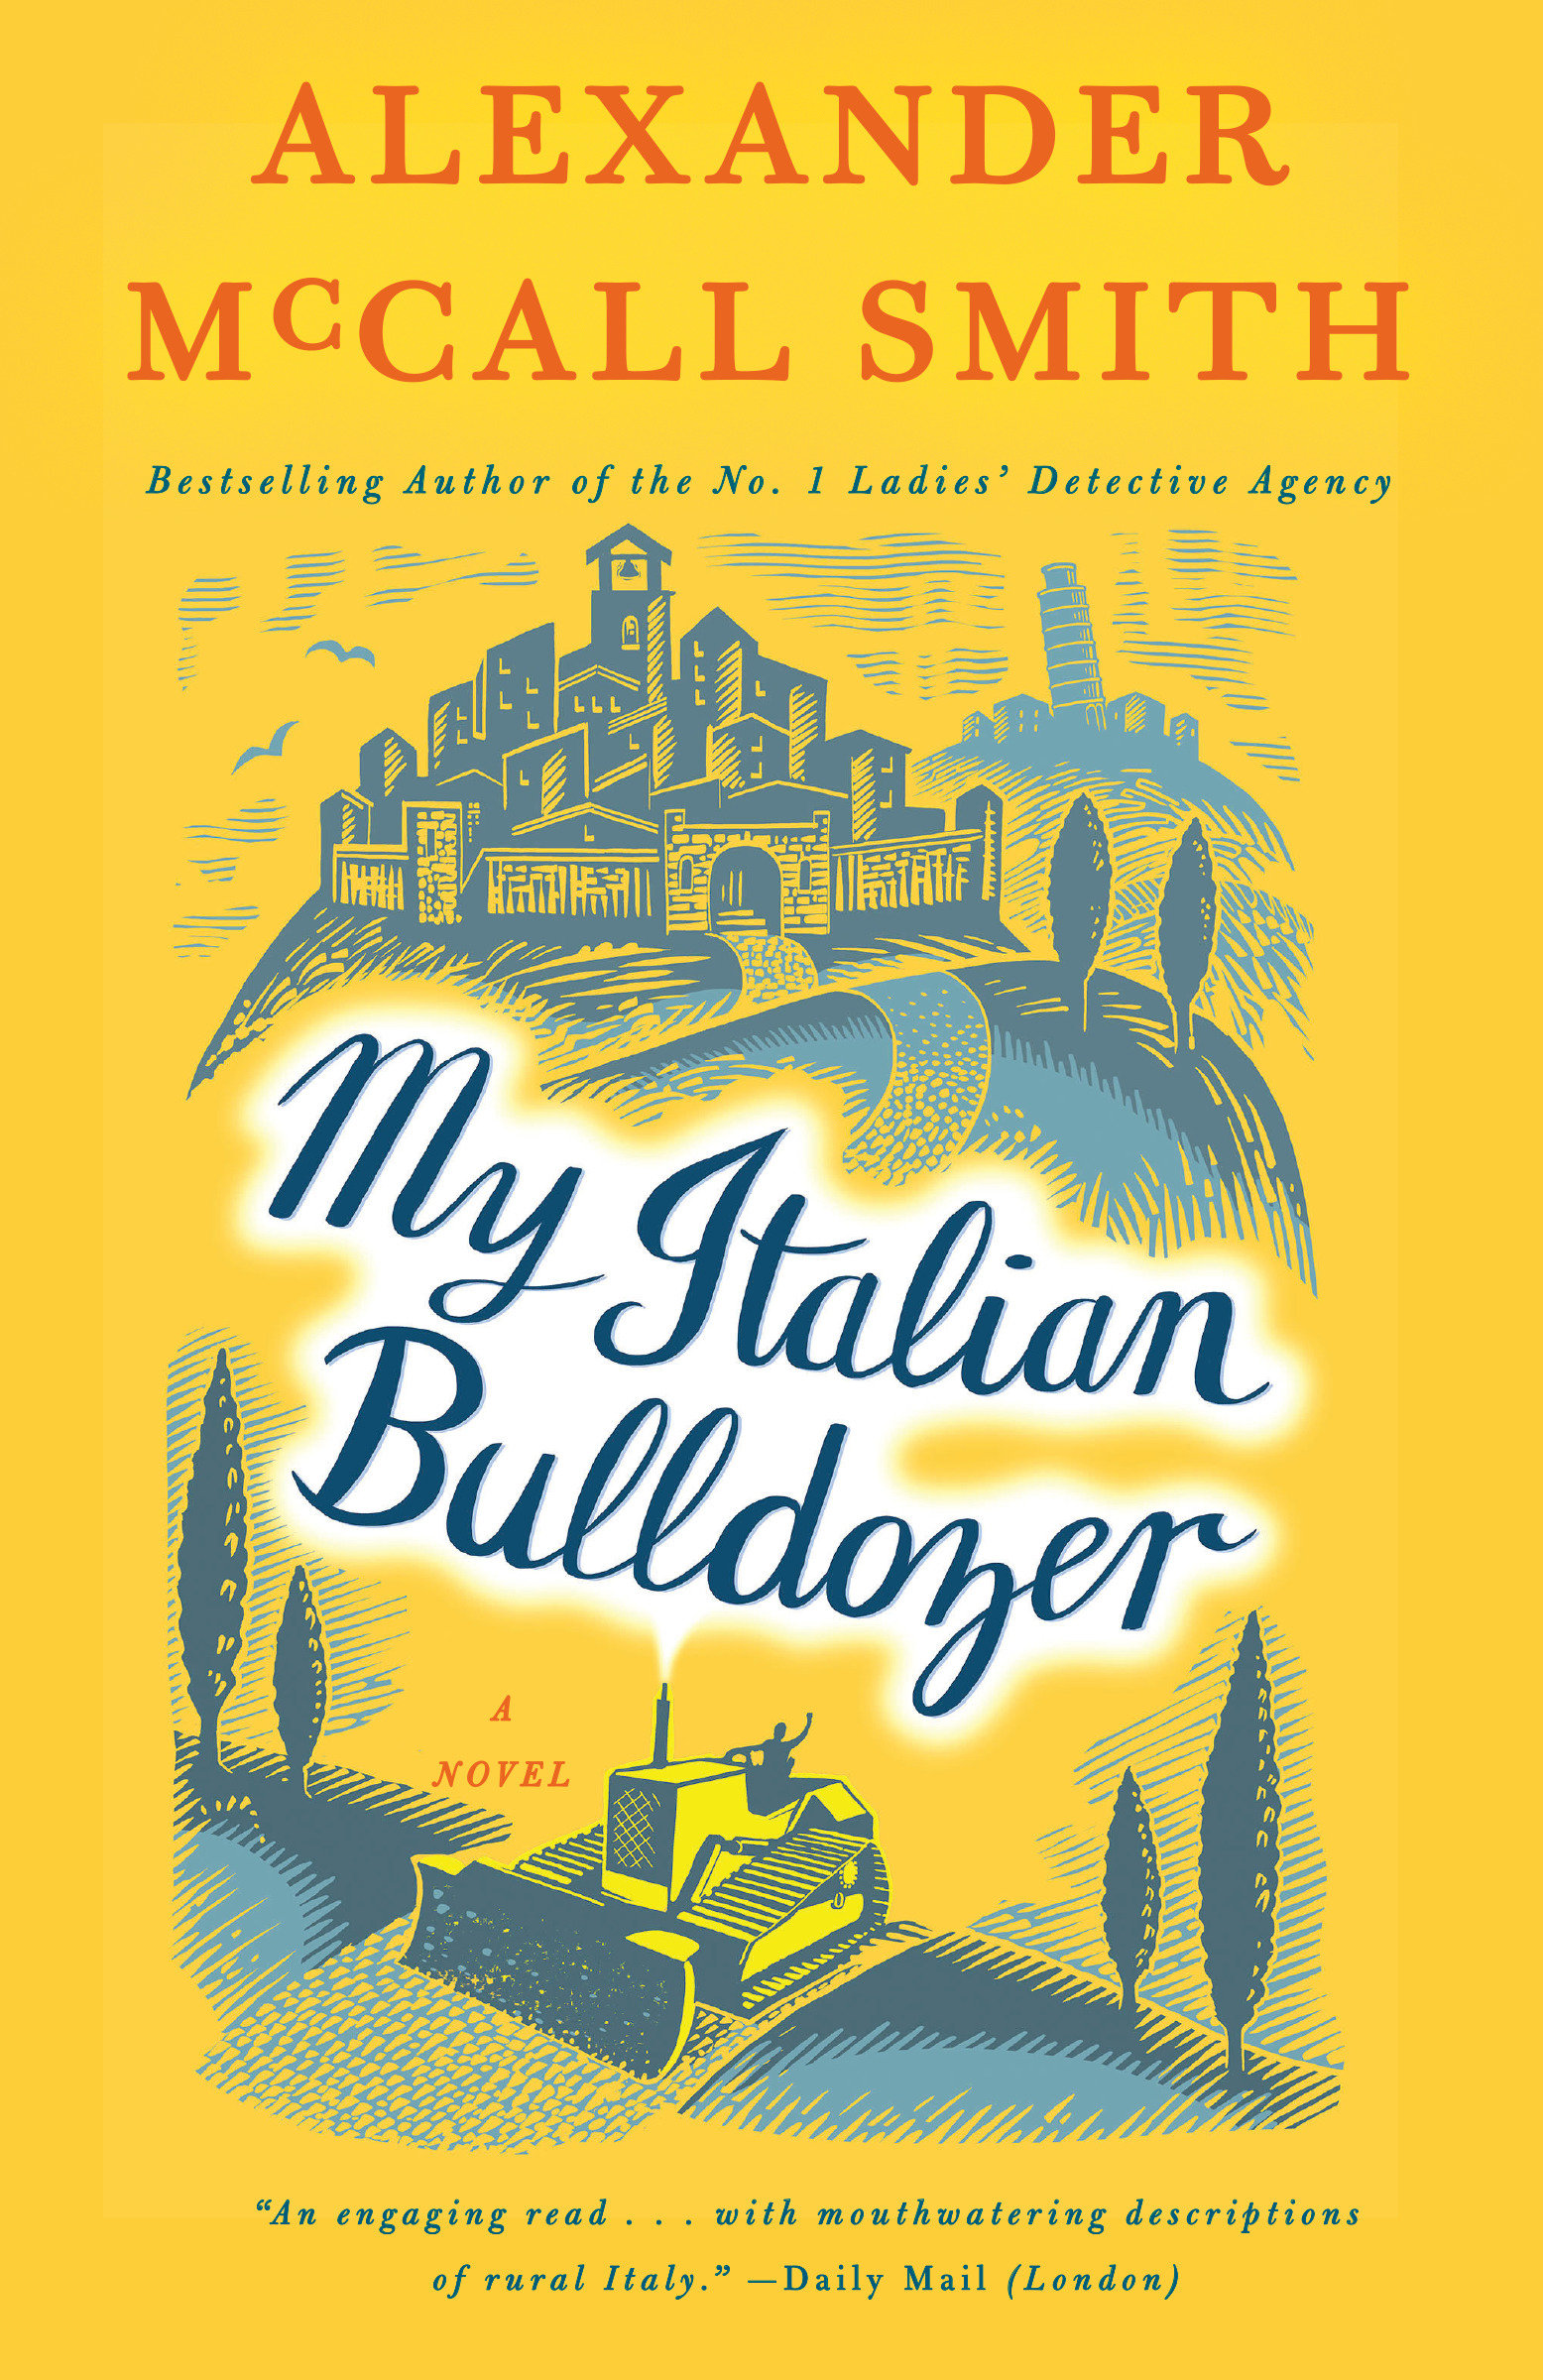 My Italian bulldozer cover image